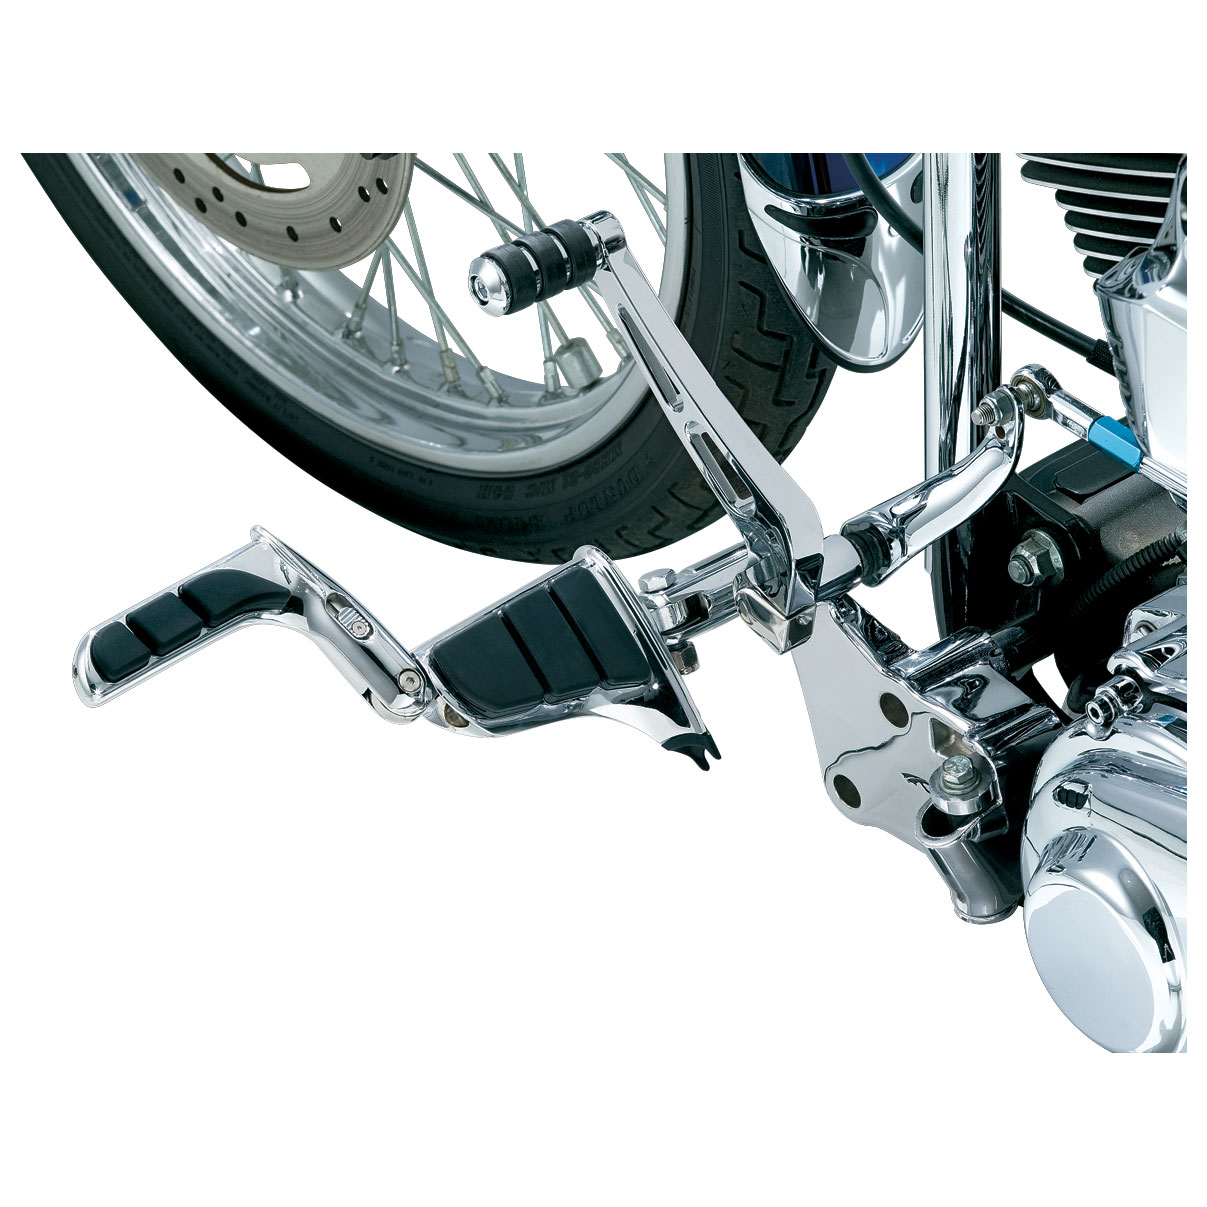 2012 Harley Softail FX//FL Springer Deuce Heritage Classic Parts Catalog Manual